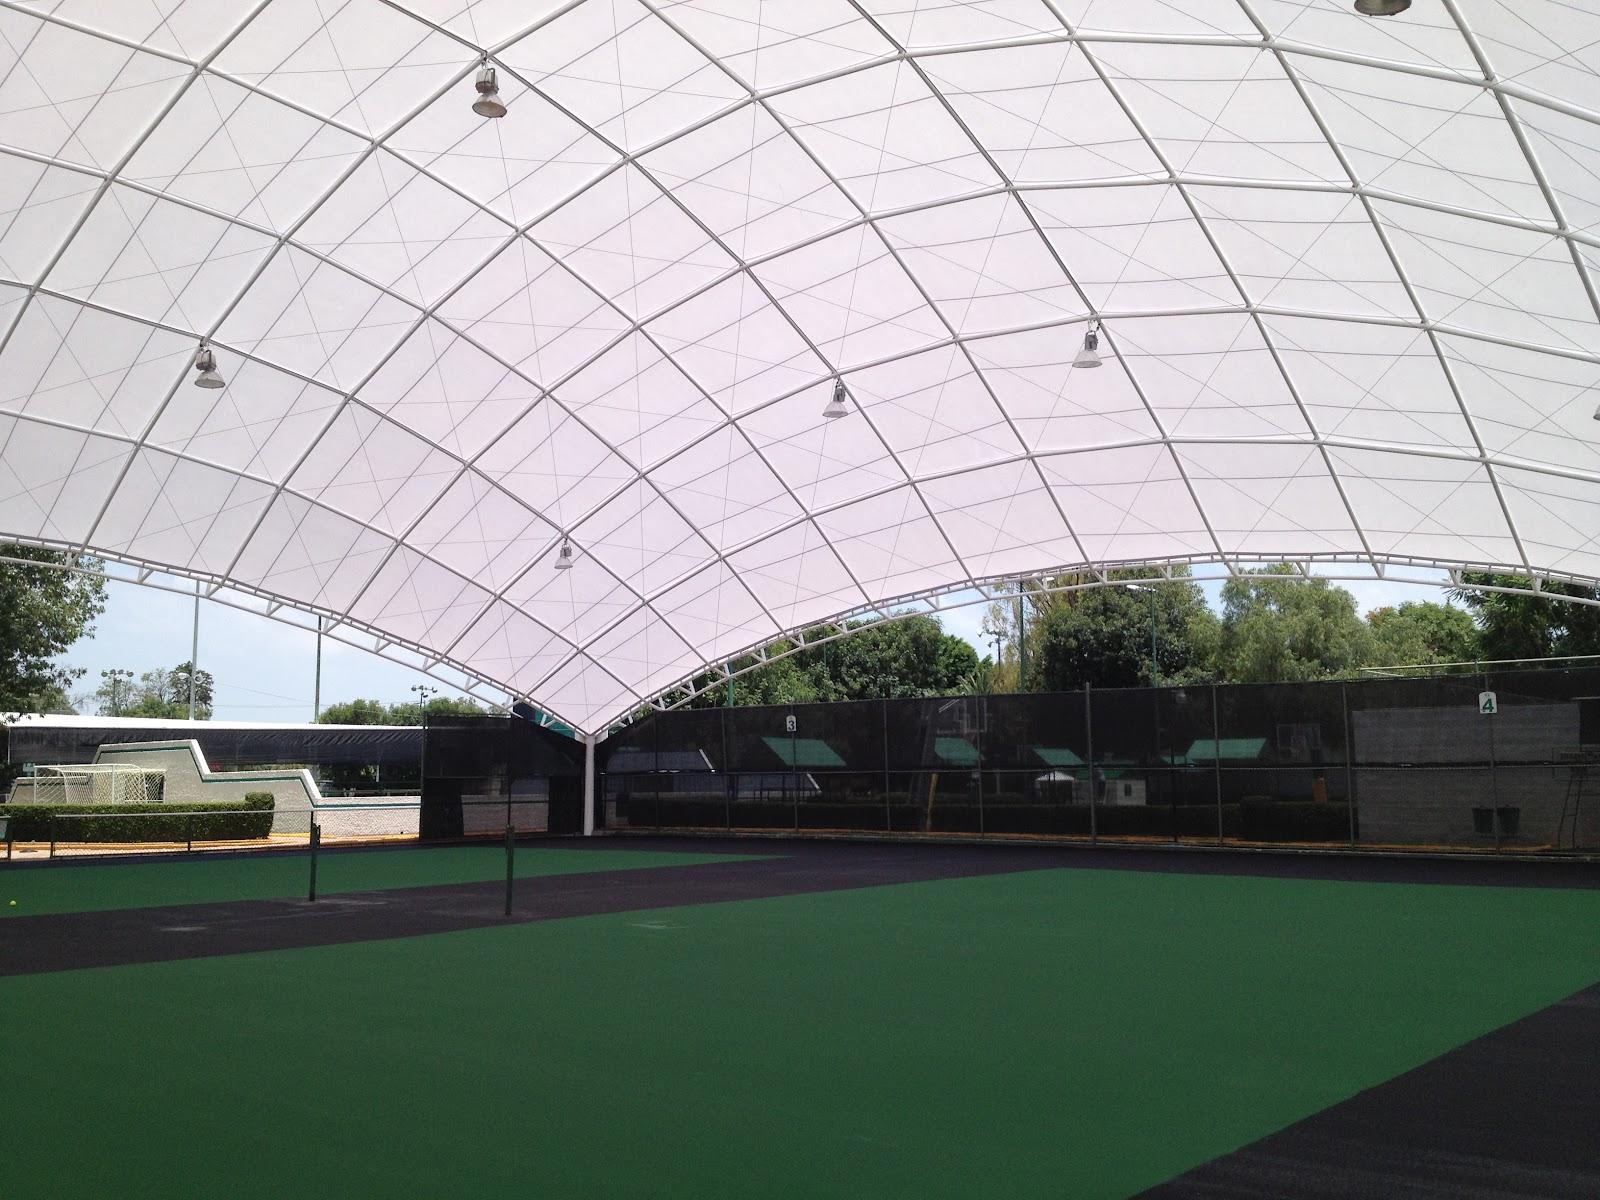 Cubiertas ligeras cubierta para dos canchas de tenis - Cubiertas metalicas ligeras ...